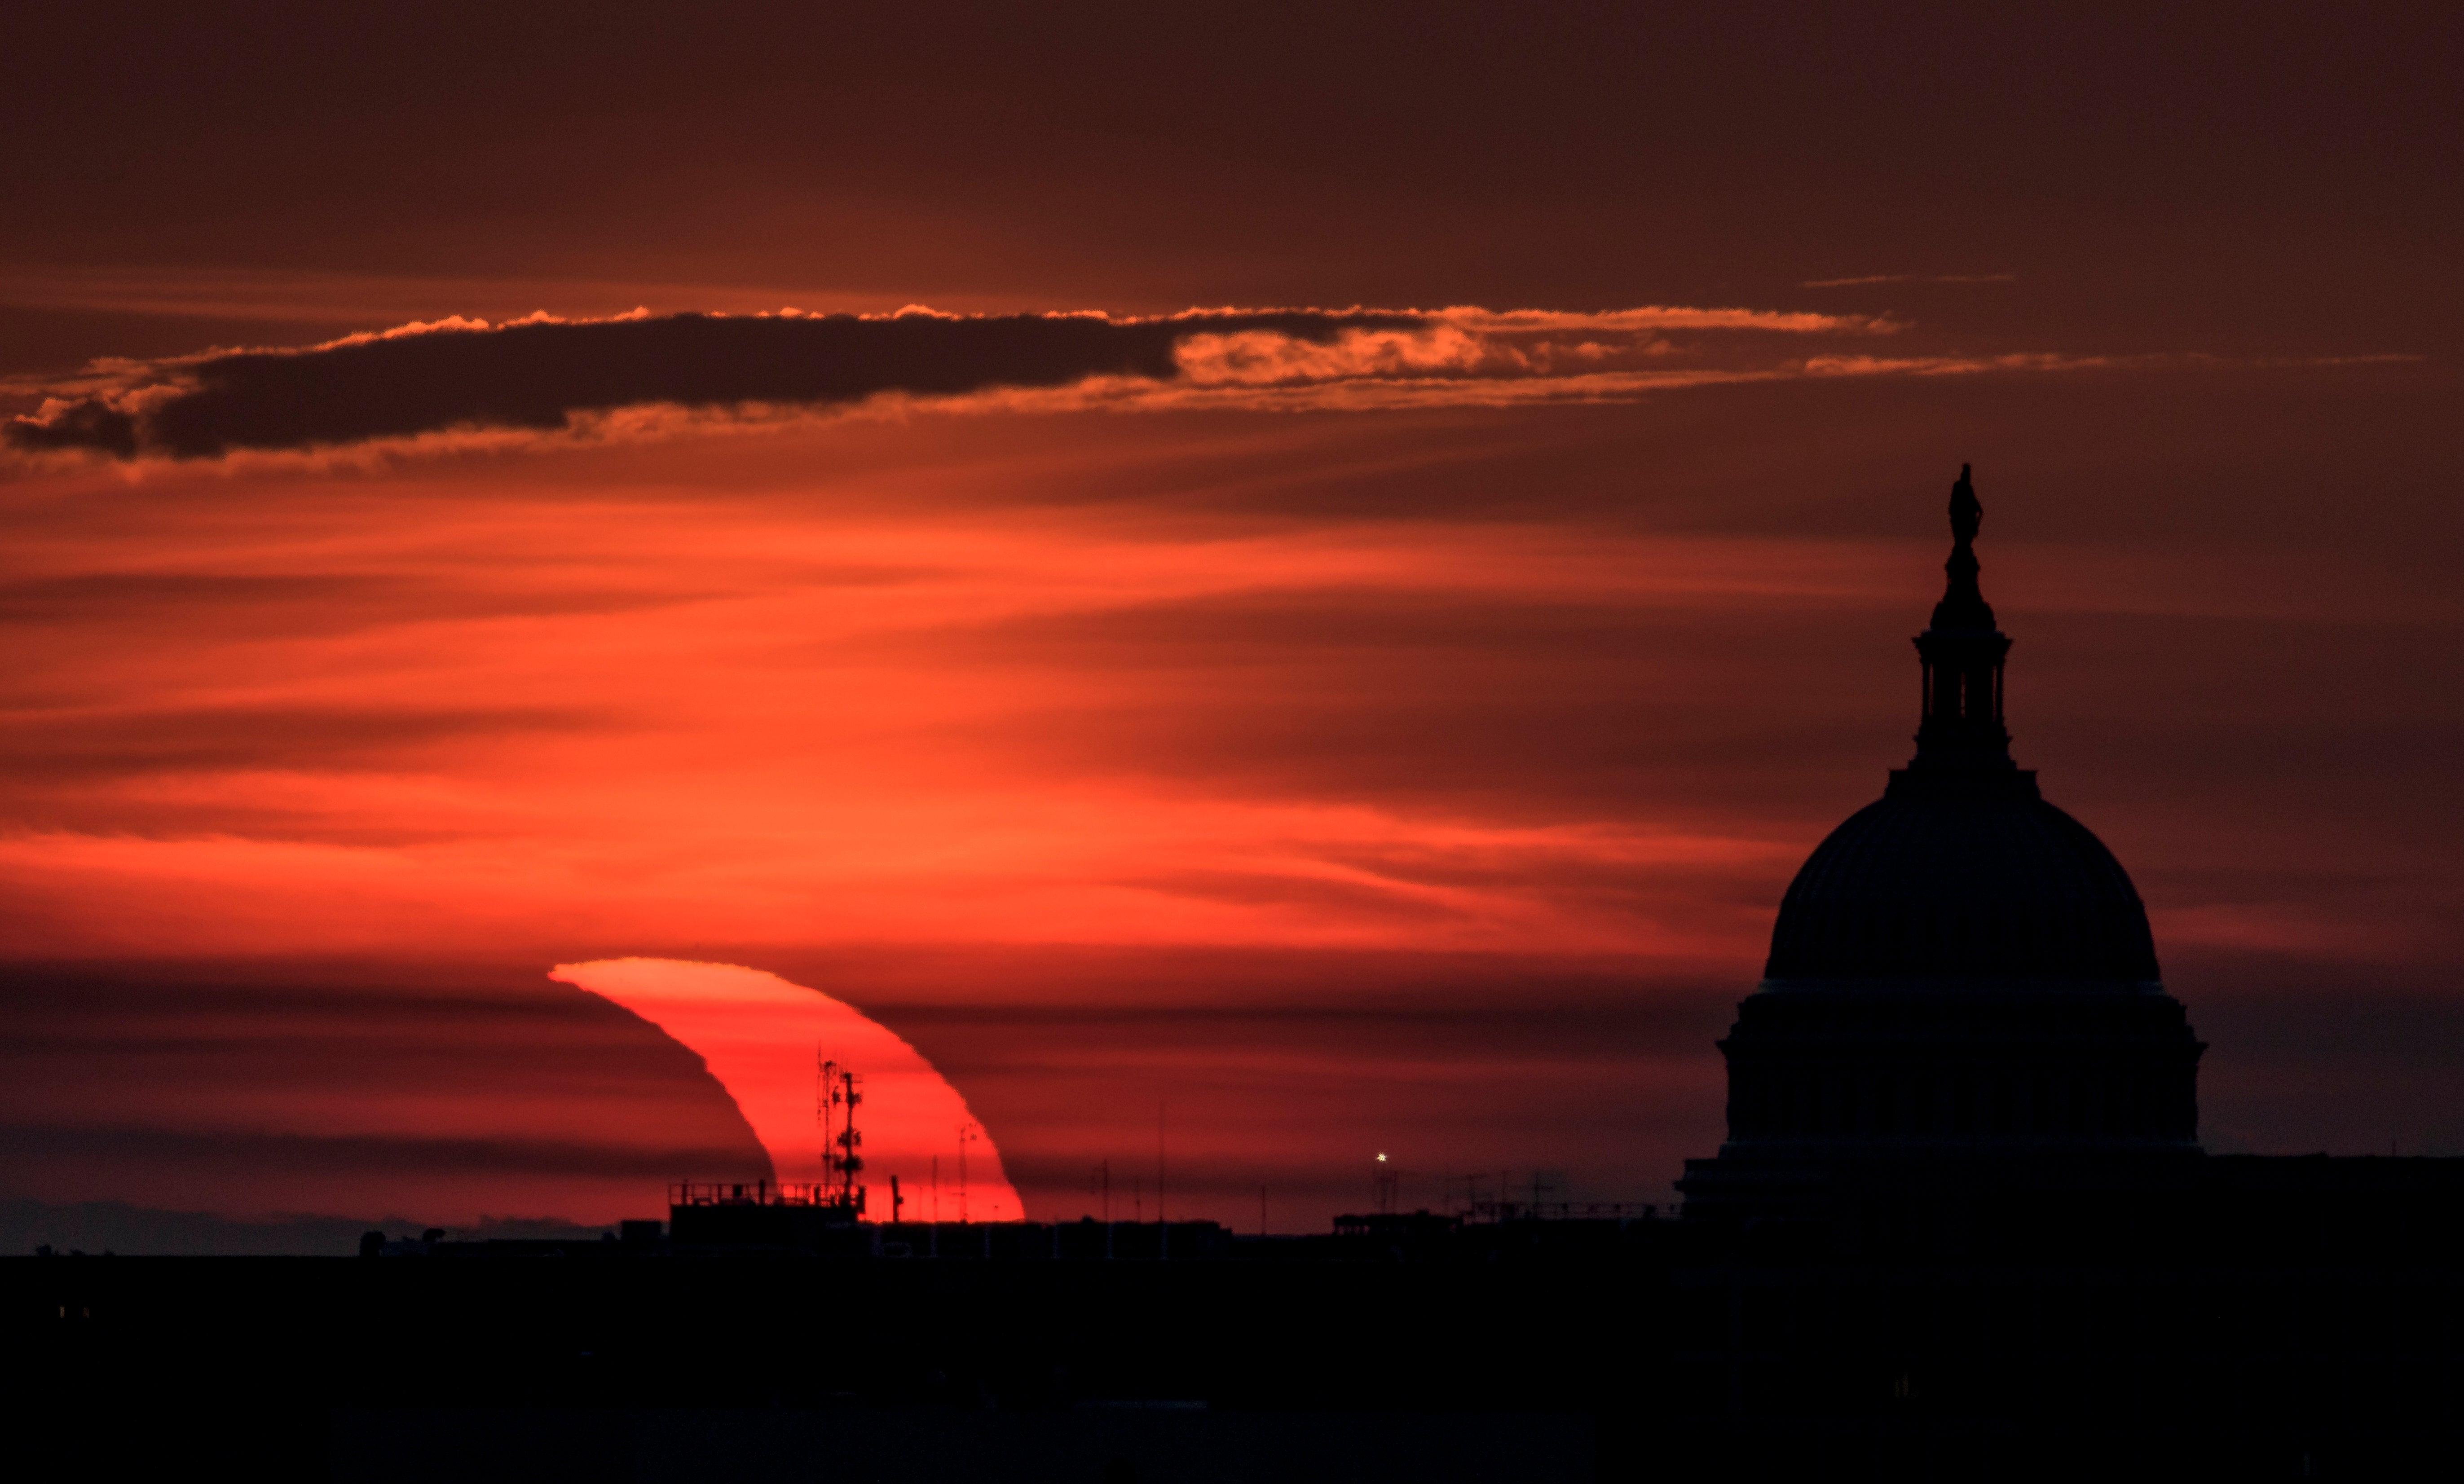 Spectacular Photos of Thursday's Solar Eclipse